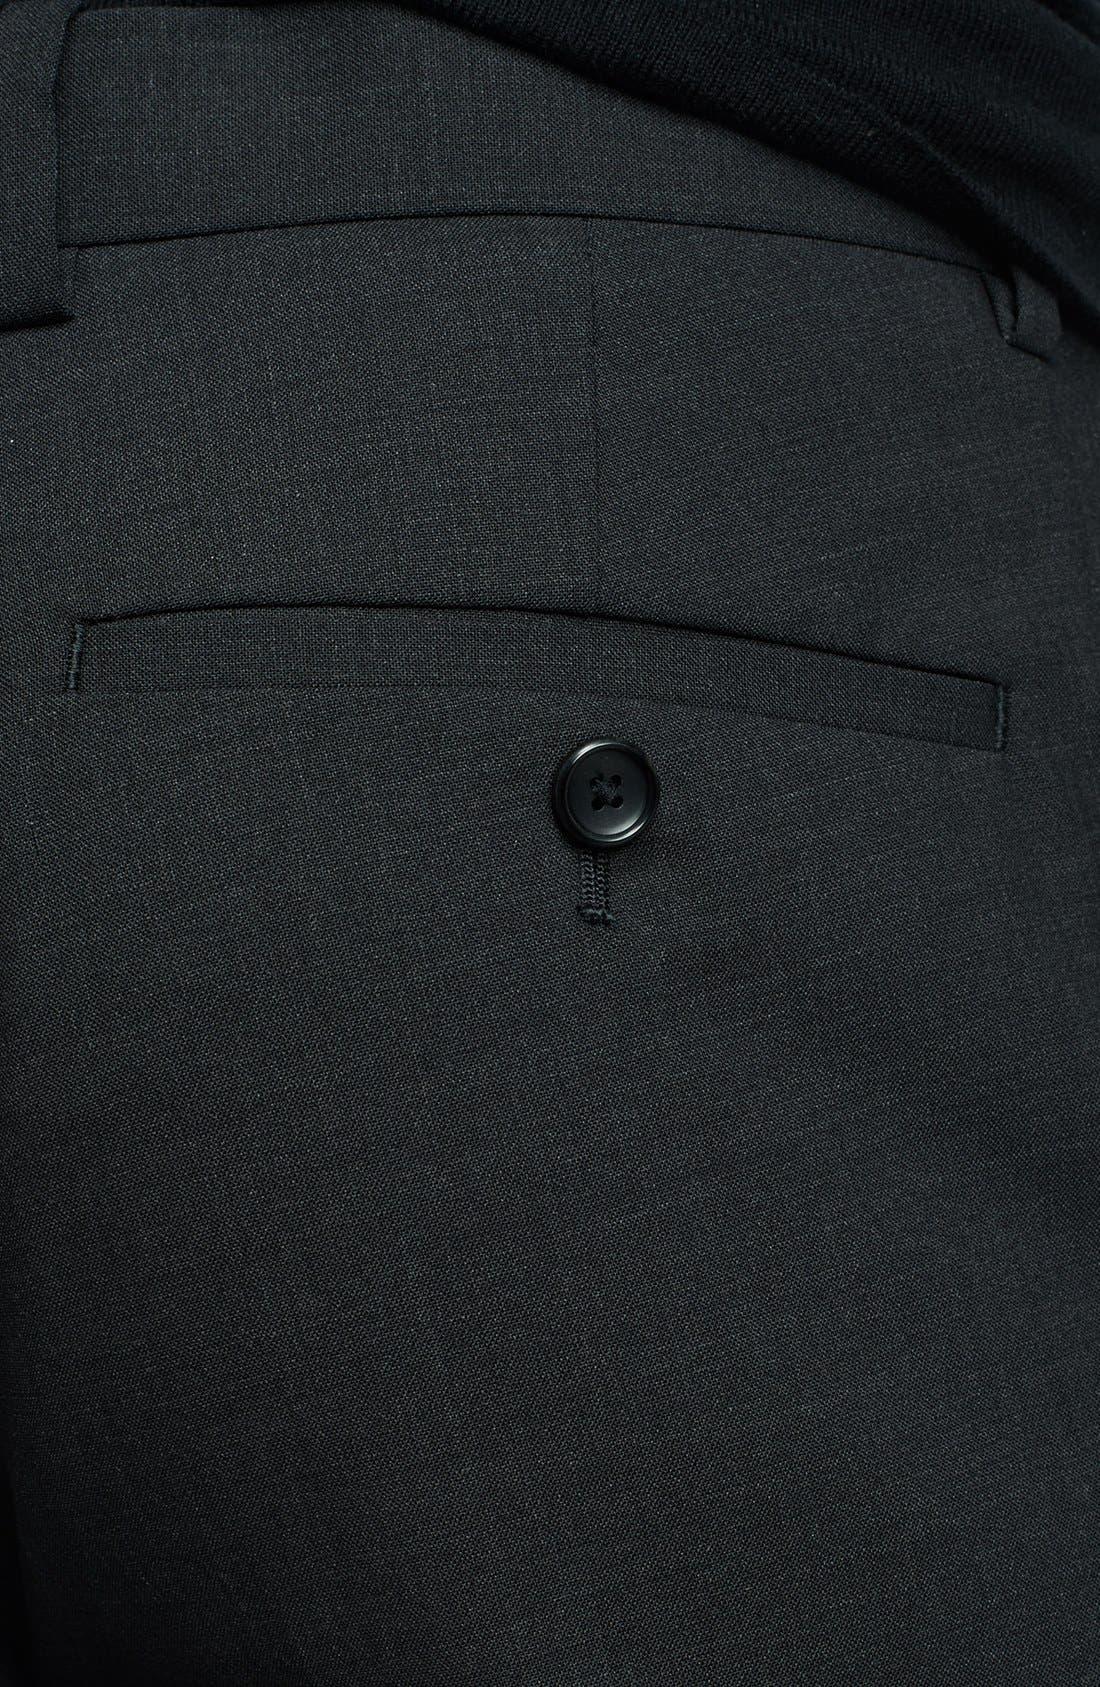 'Marlo New Tailor' Slim Fit Pants,                             Alternate thumbnail 8, color,